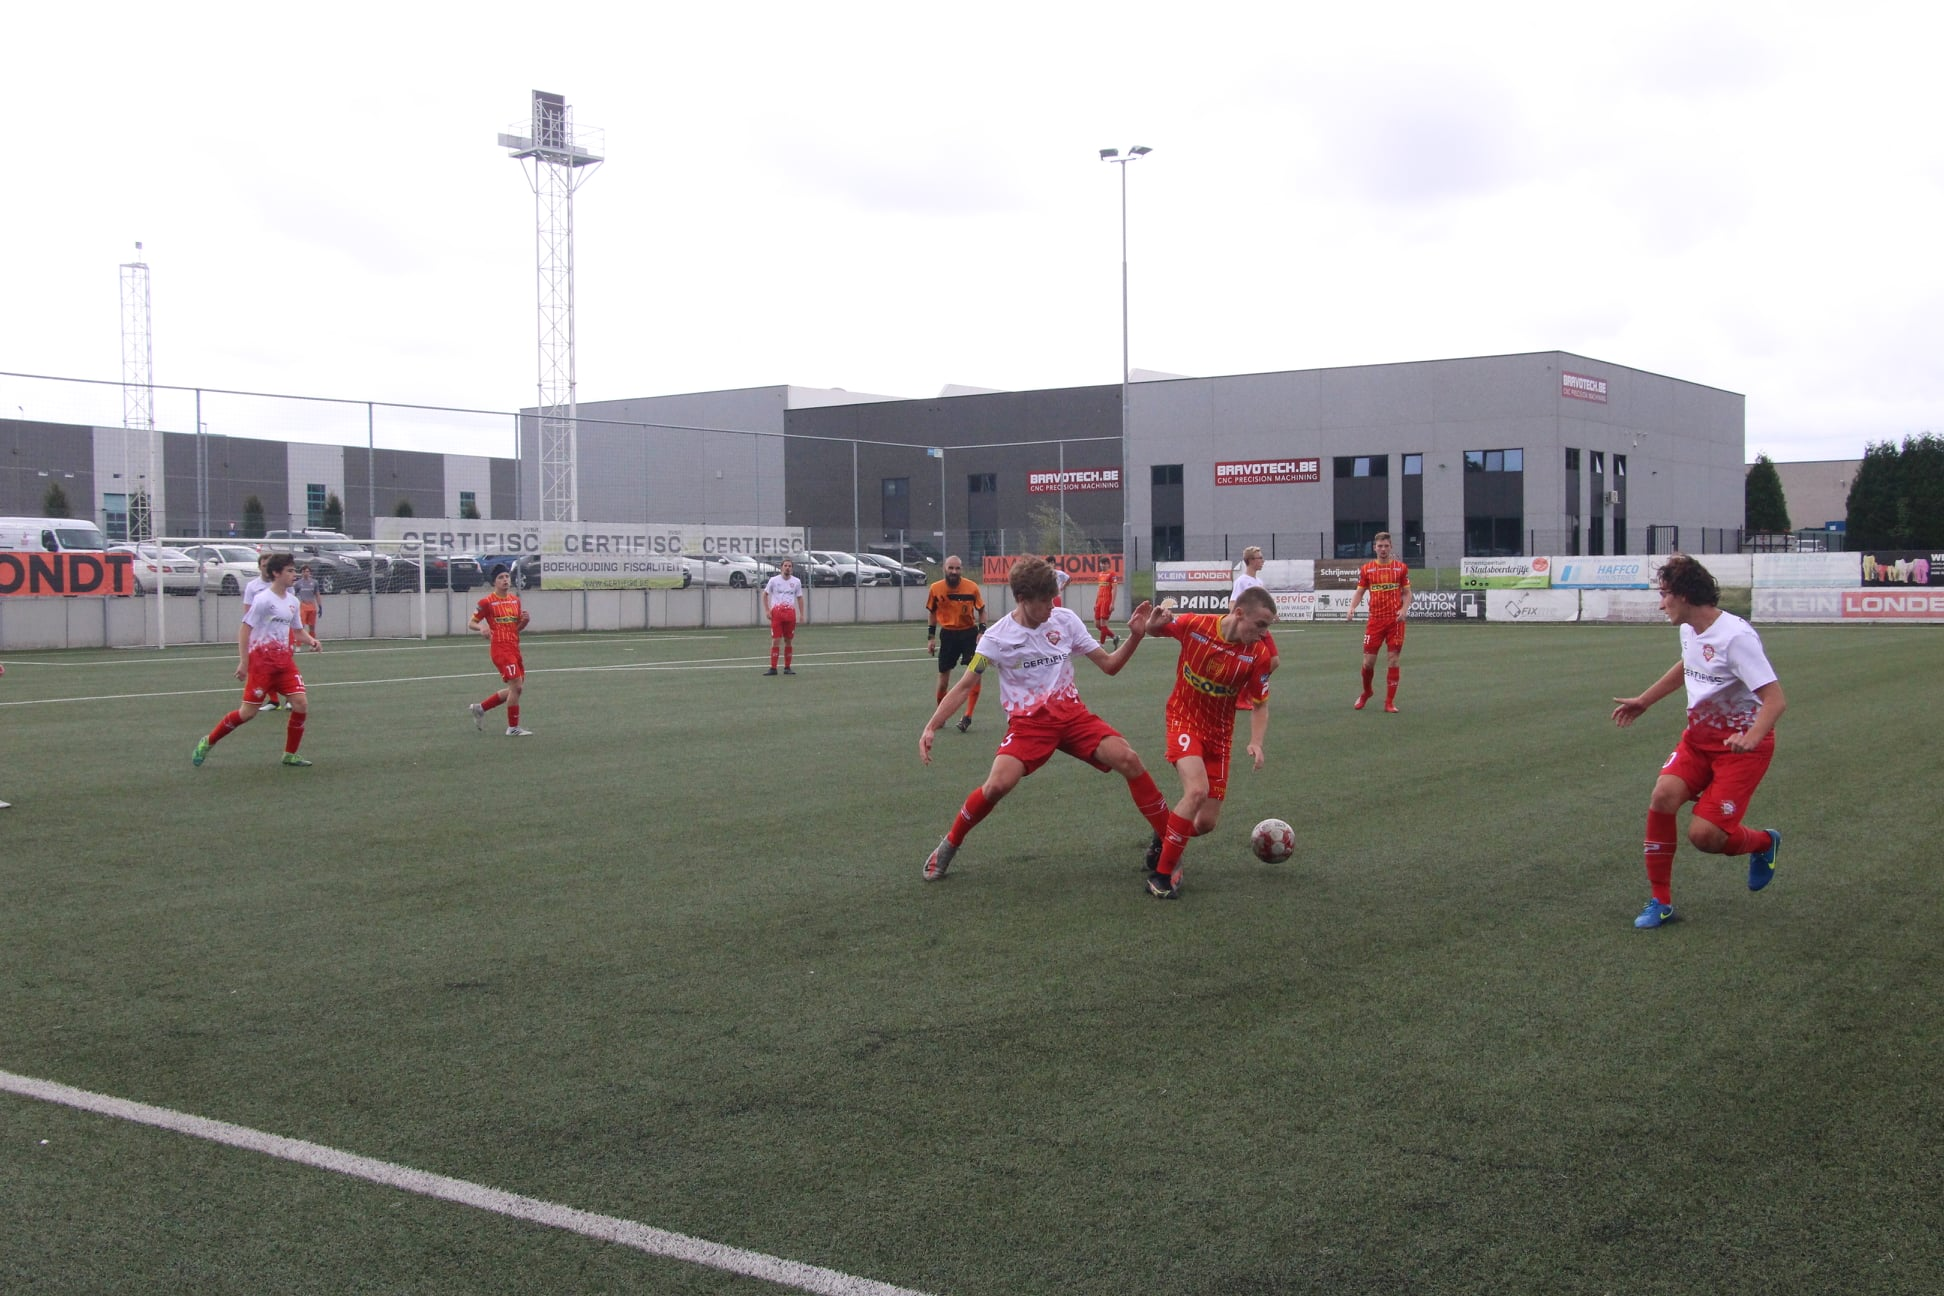 KwikBeloften_anzegem29-08-2021(2)